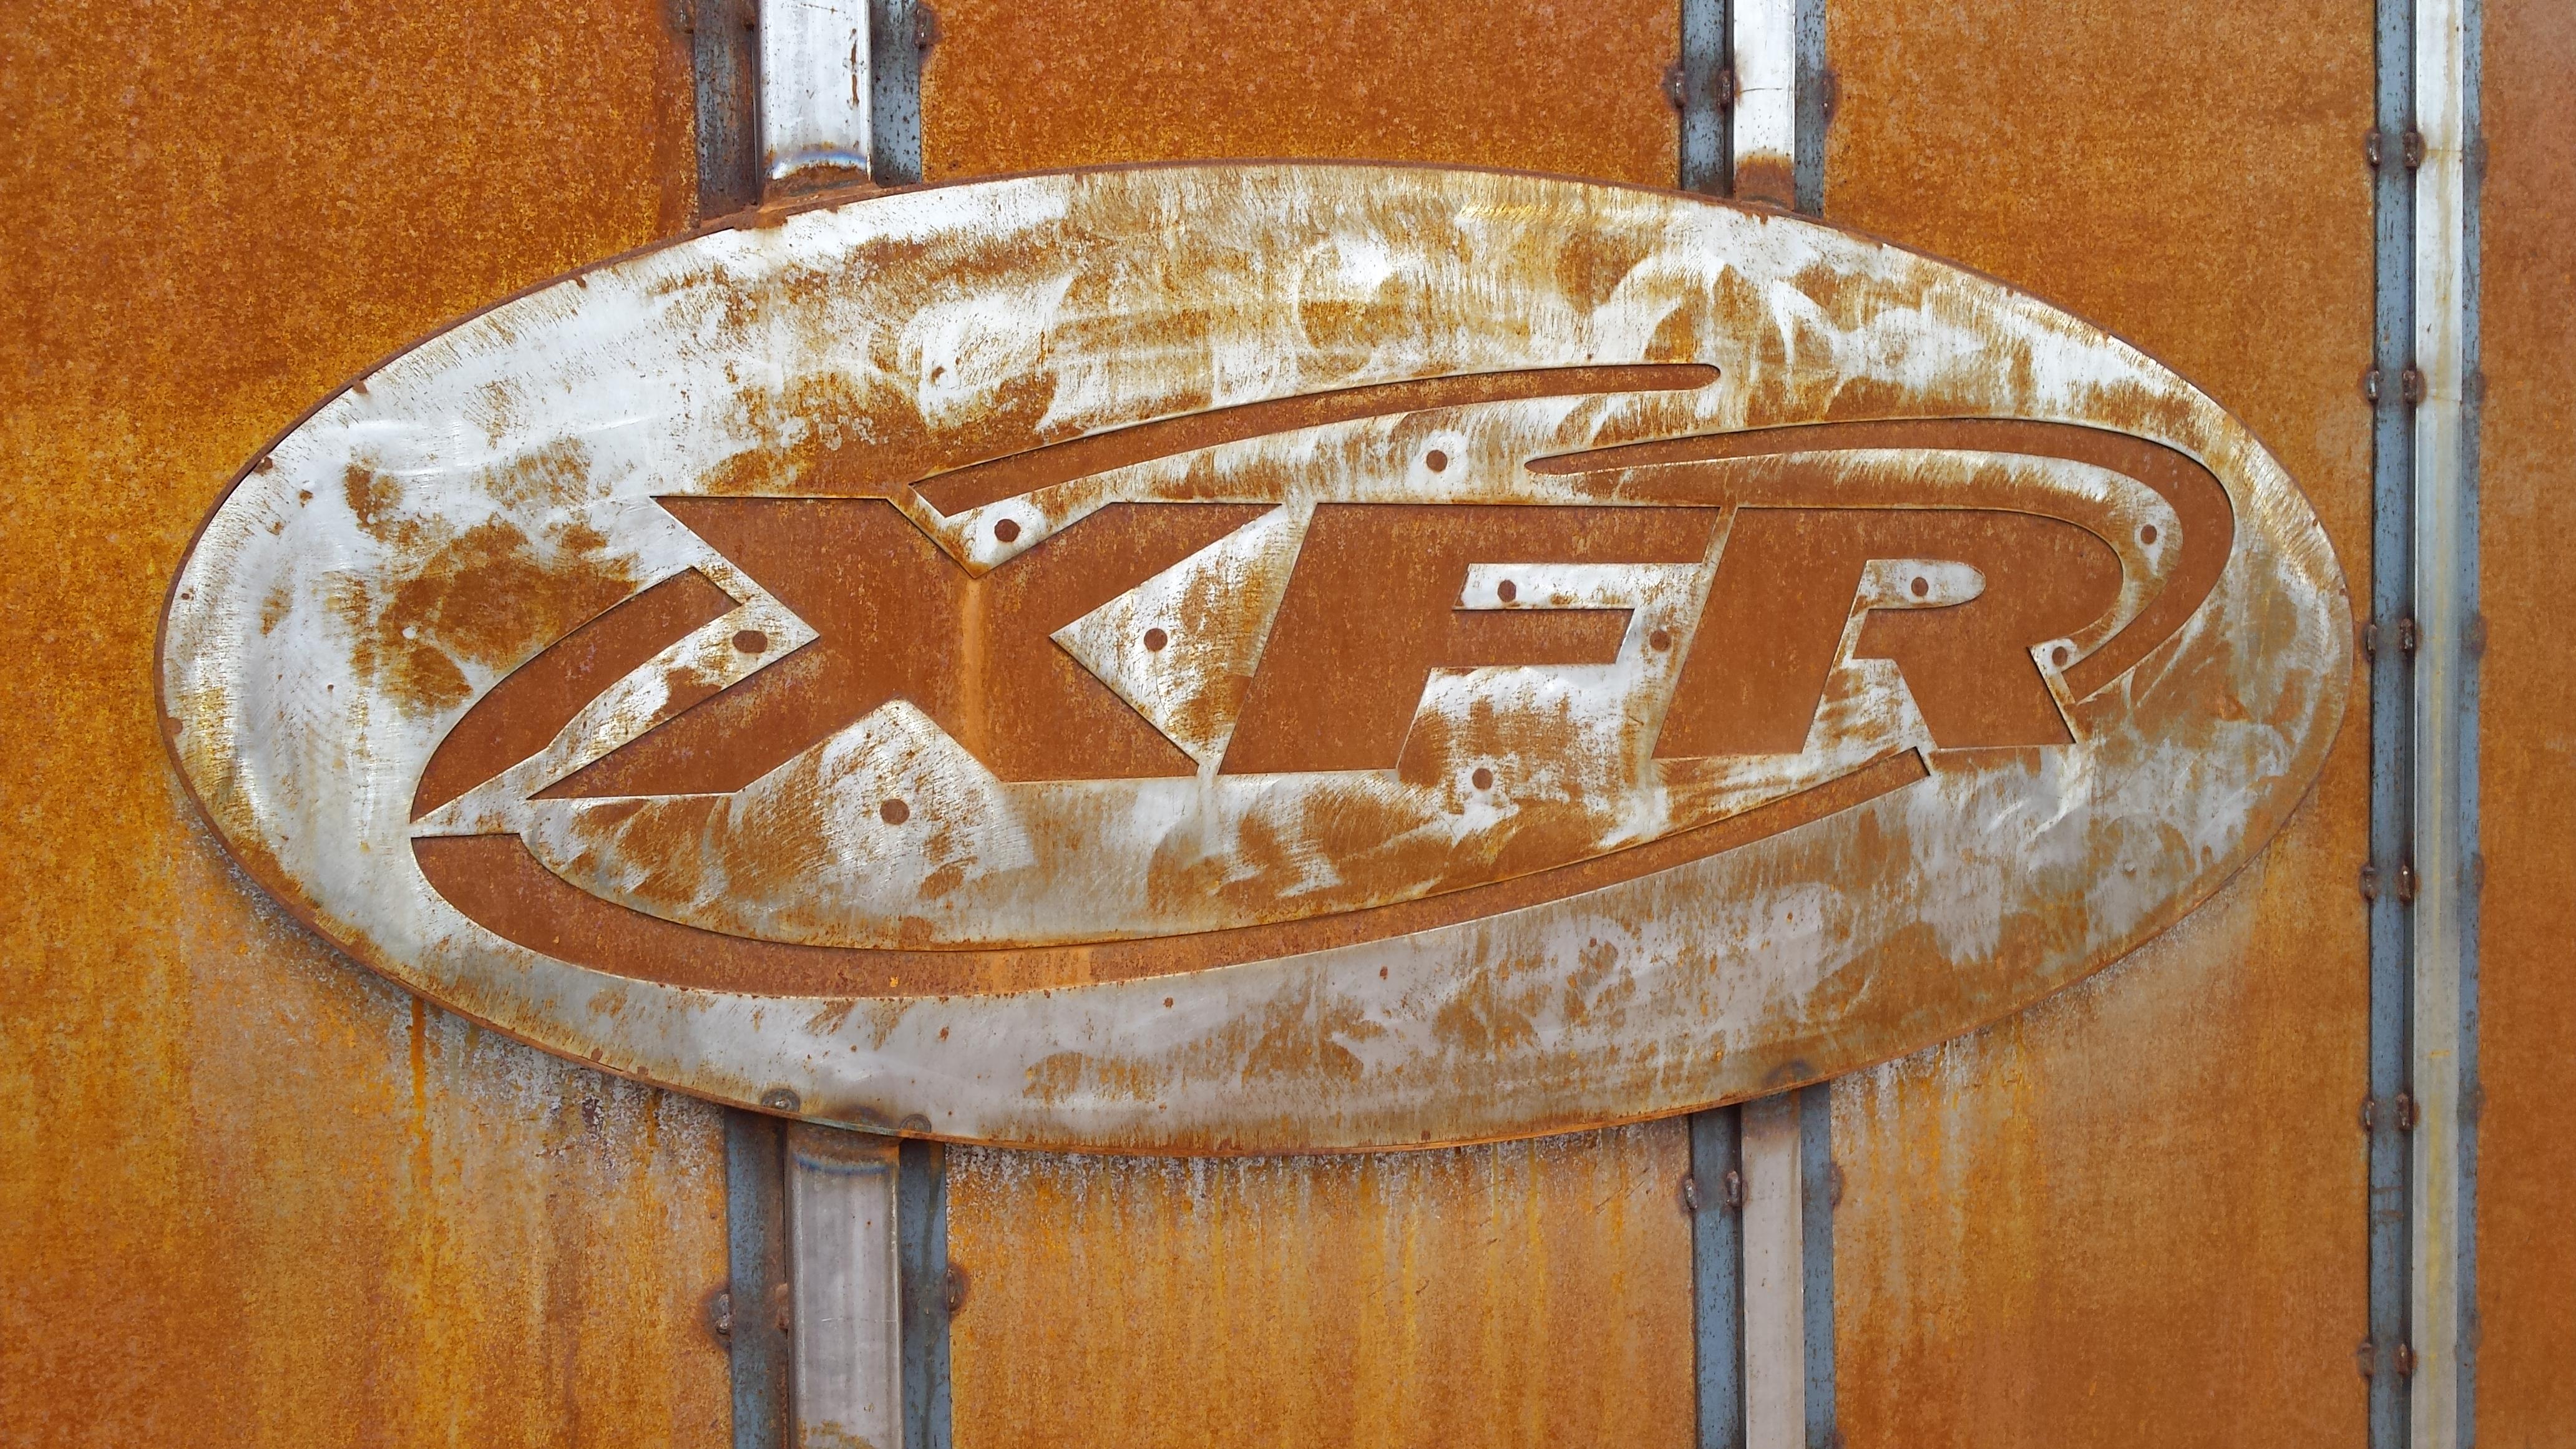 xfr-gate-raw-steel.jpg